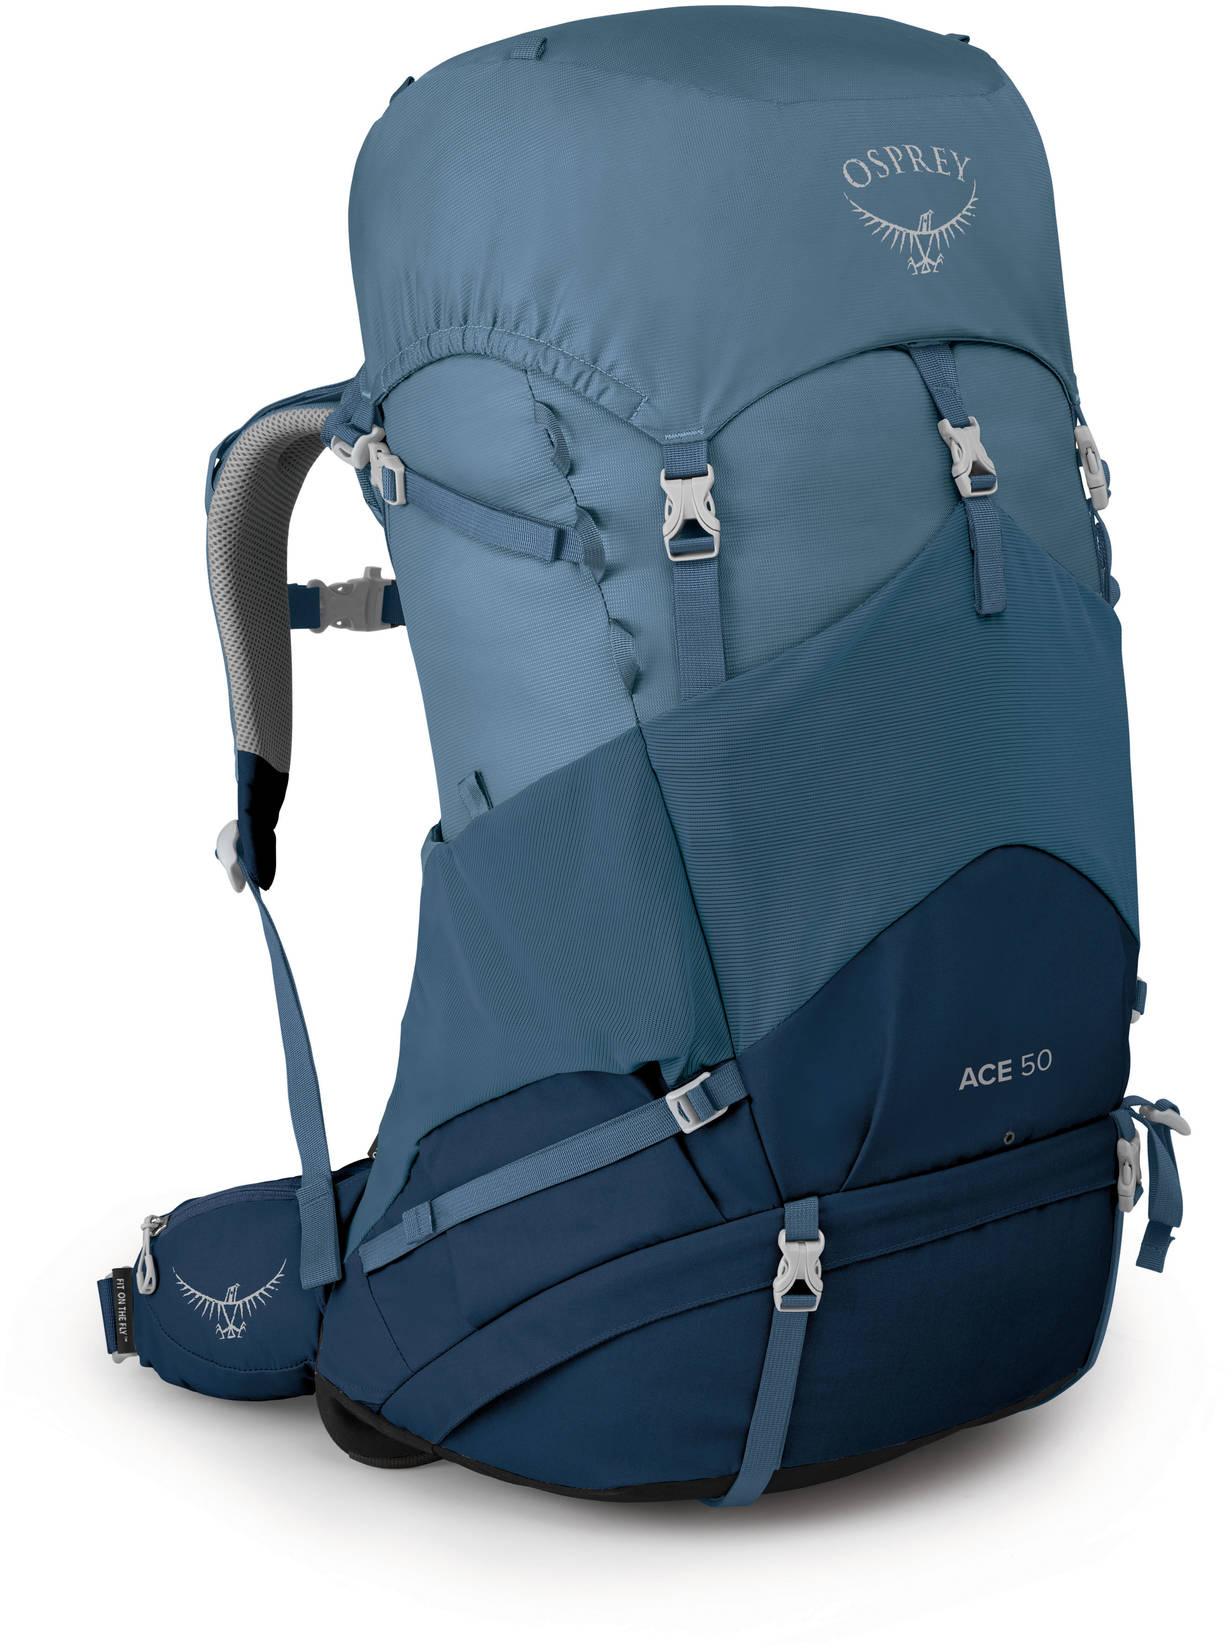 Ace Рюкзак Osprey Ace 50 Blue Hills Ace_50_S20_Side_Blue_Hills_web.jpg